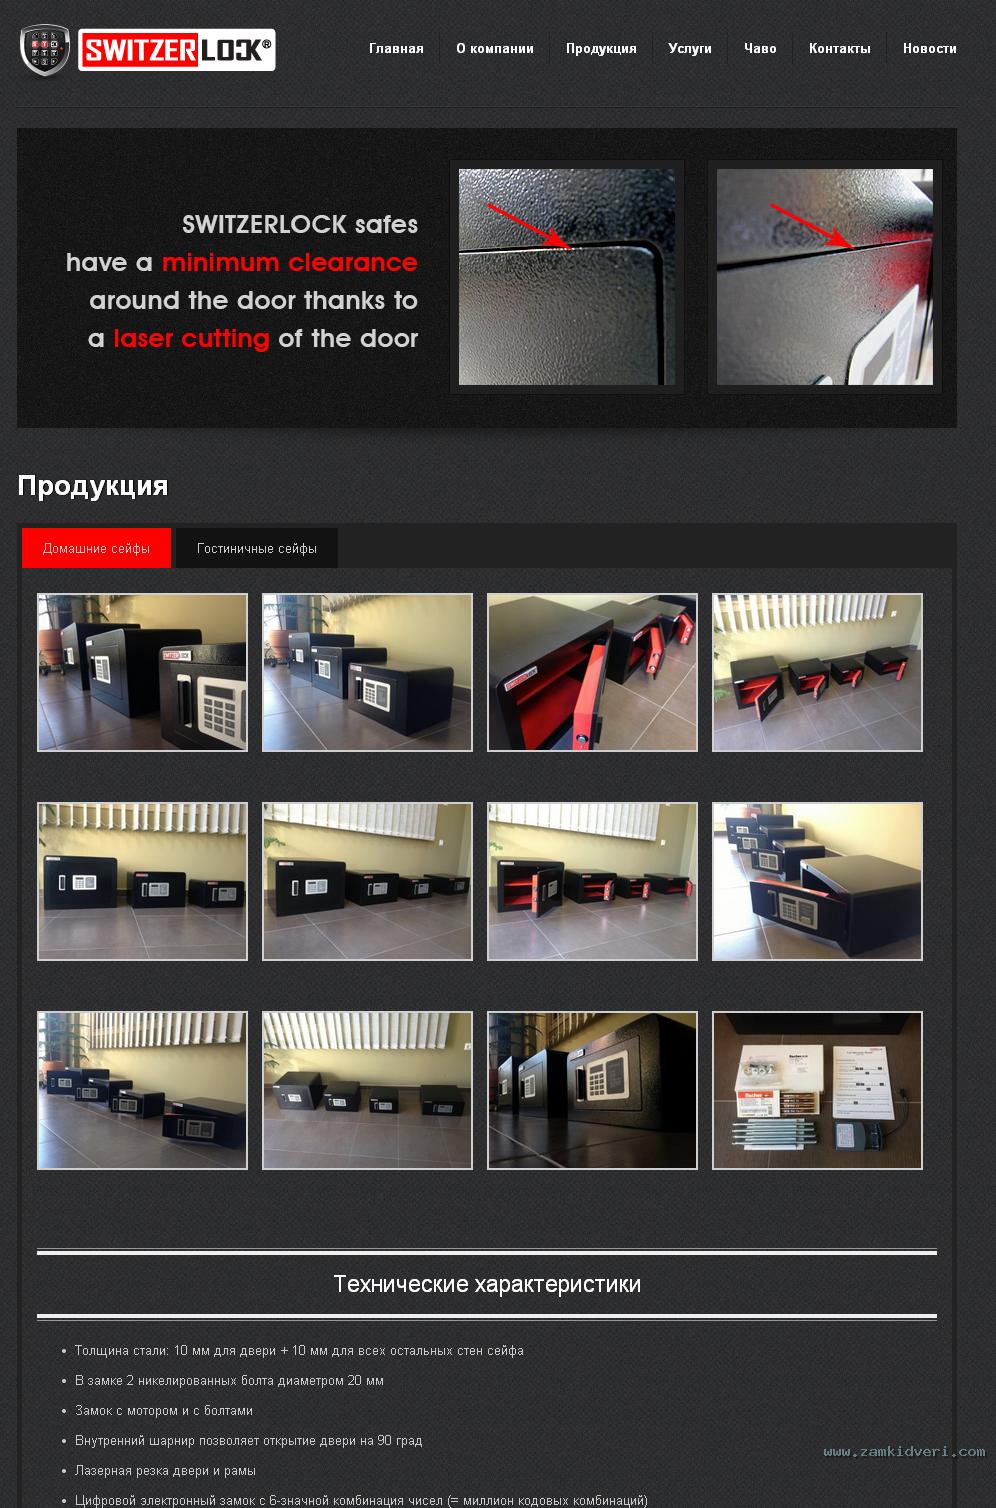 Нажмите на изображение для увеличения Название: Скриншот 2014-01-20 20.11.14.png Просмотров: 0 Размер:1.51 Мб ID:32433